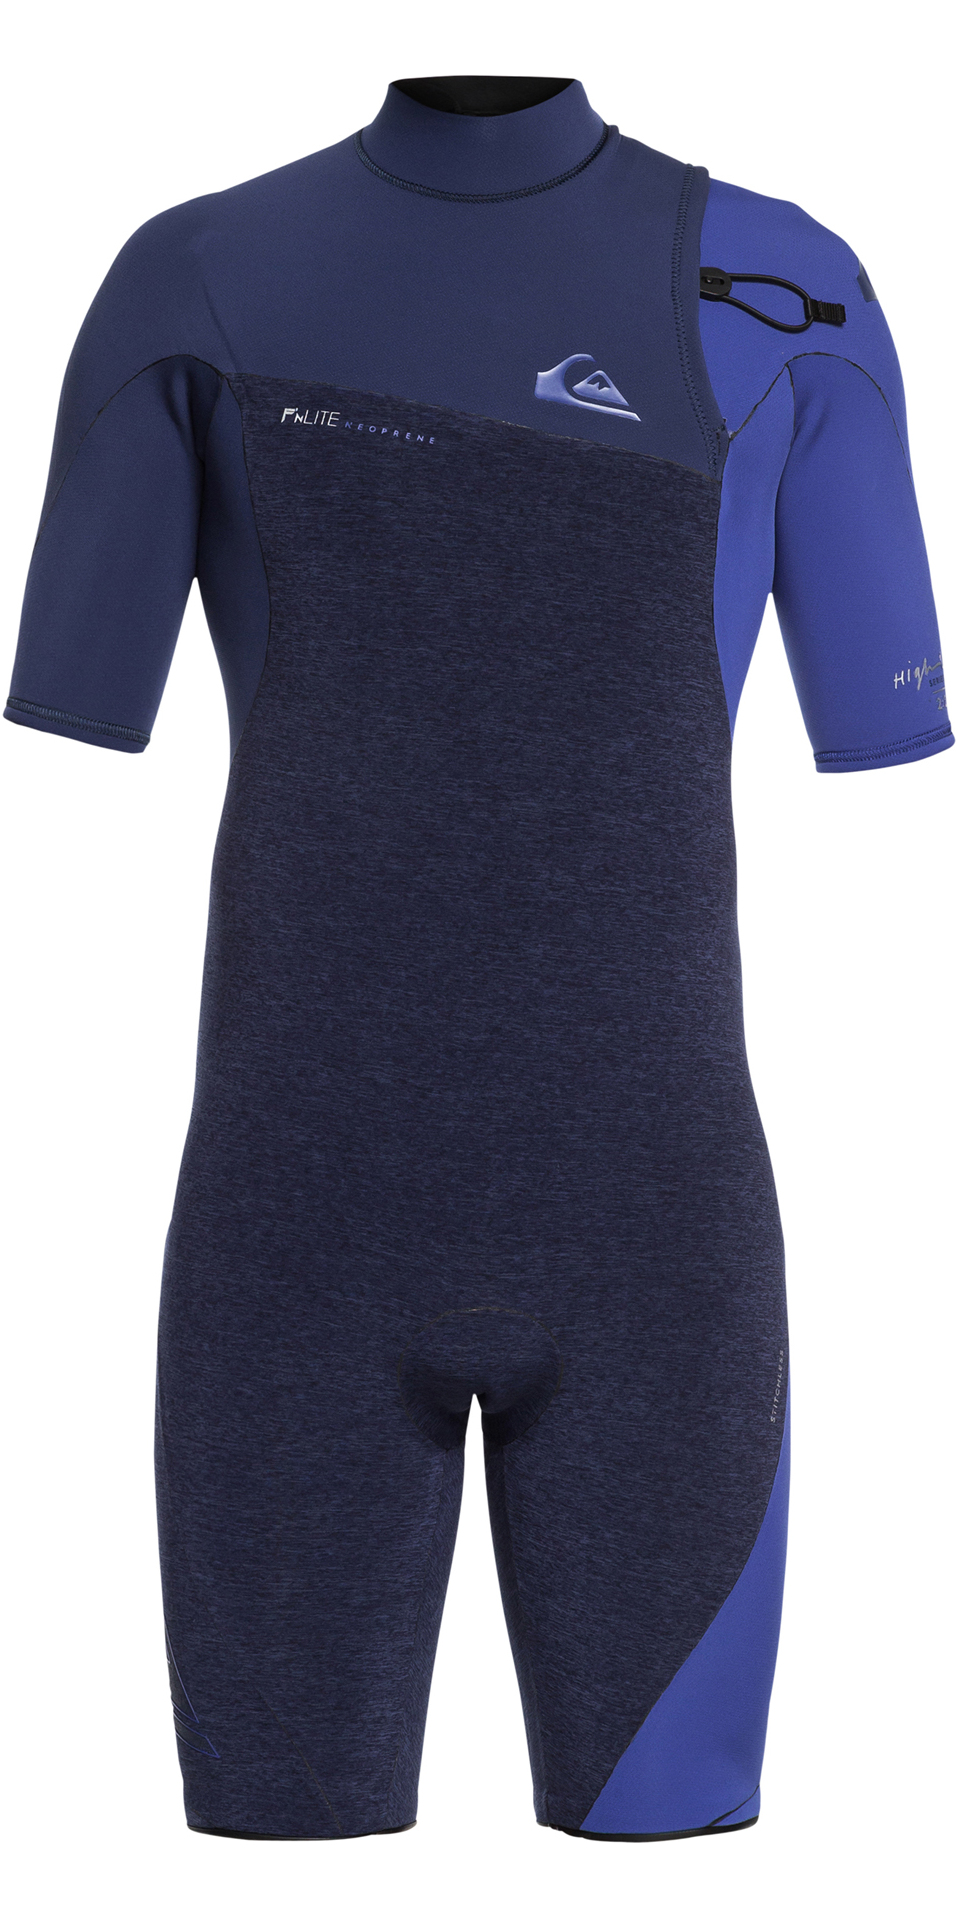 2019 Quiksilver Highline 2mm Zipperless Shorty Wetsuit Navy EQYW503009